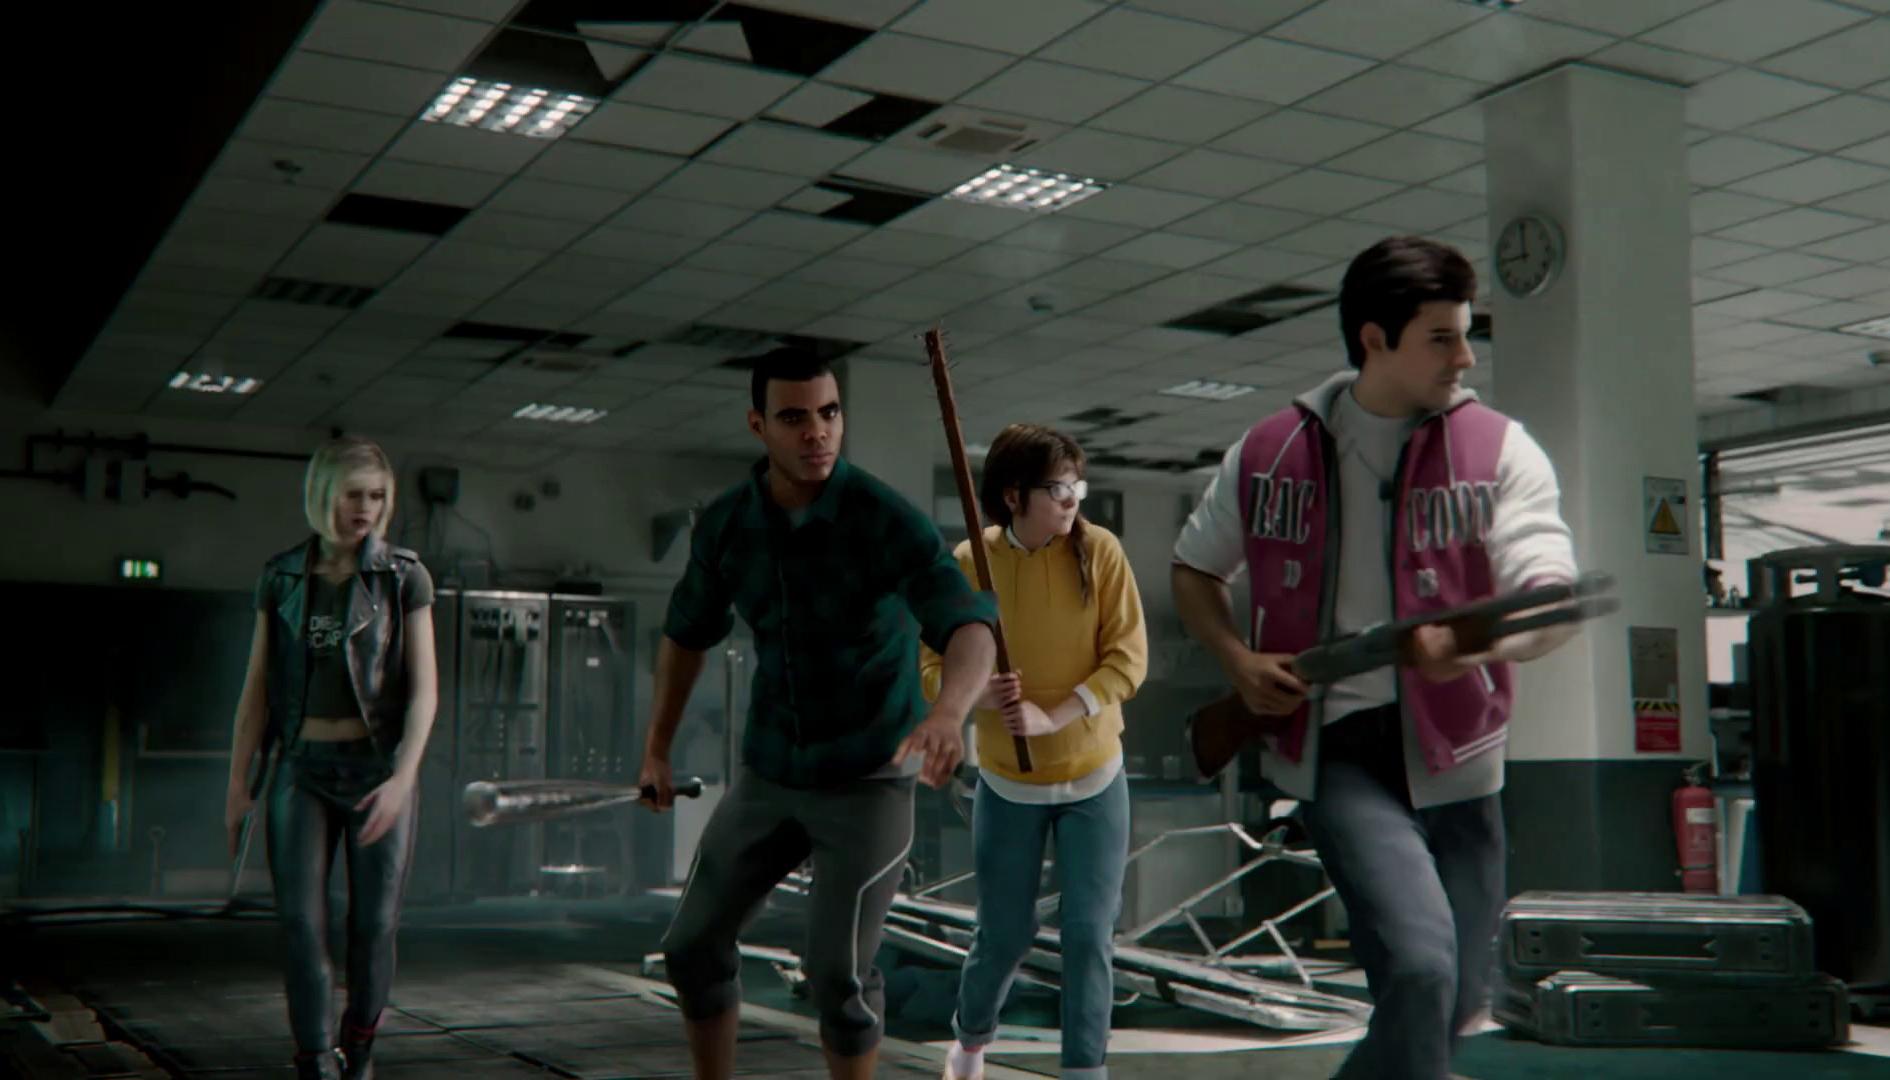 Resident Evil Project Resistance: svelato il gameplay 4 vs 1